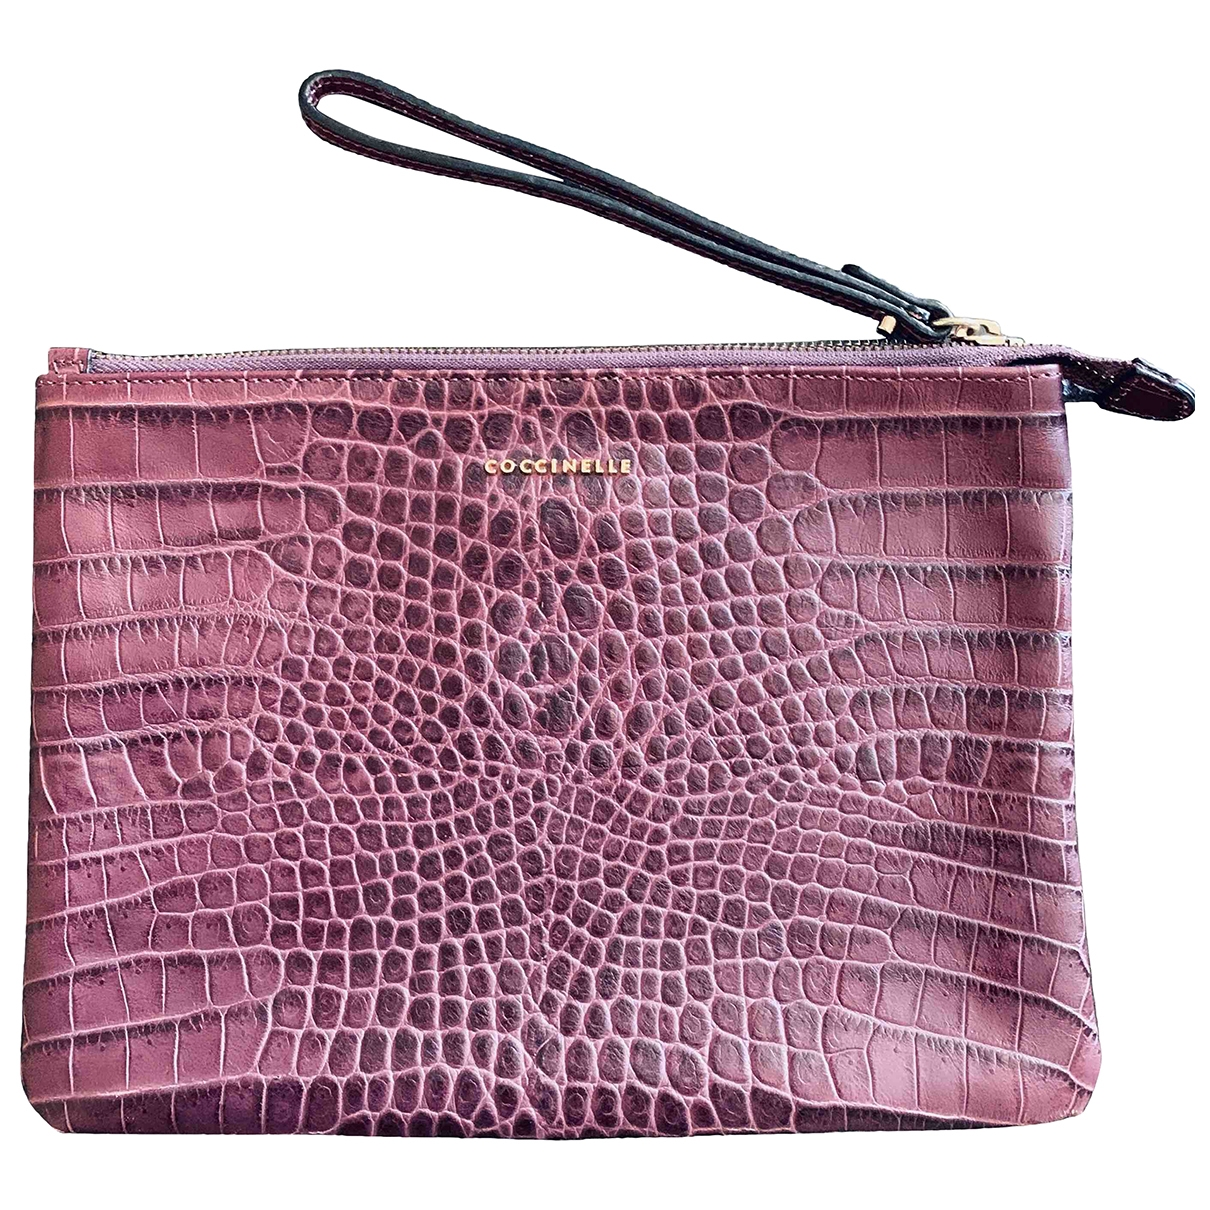 Coccinelle \N Burgundy Leather Clutch bag for Women \N